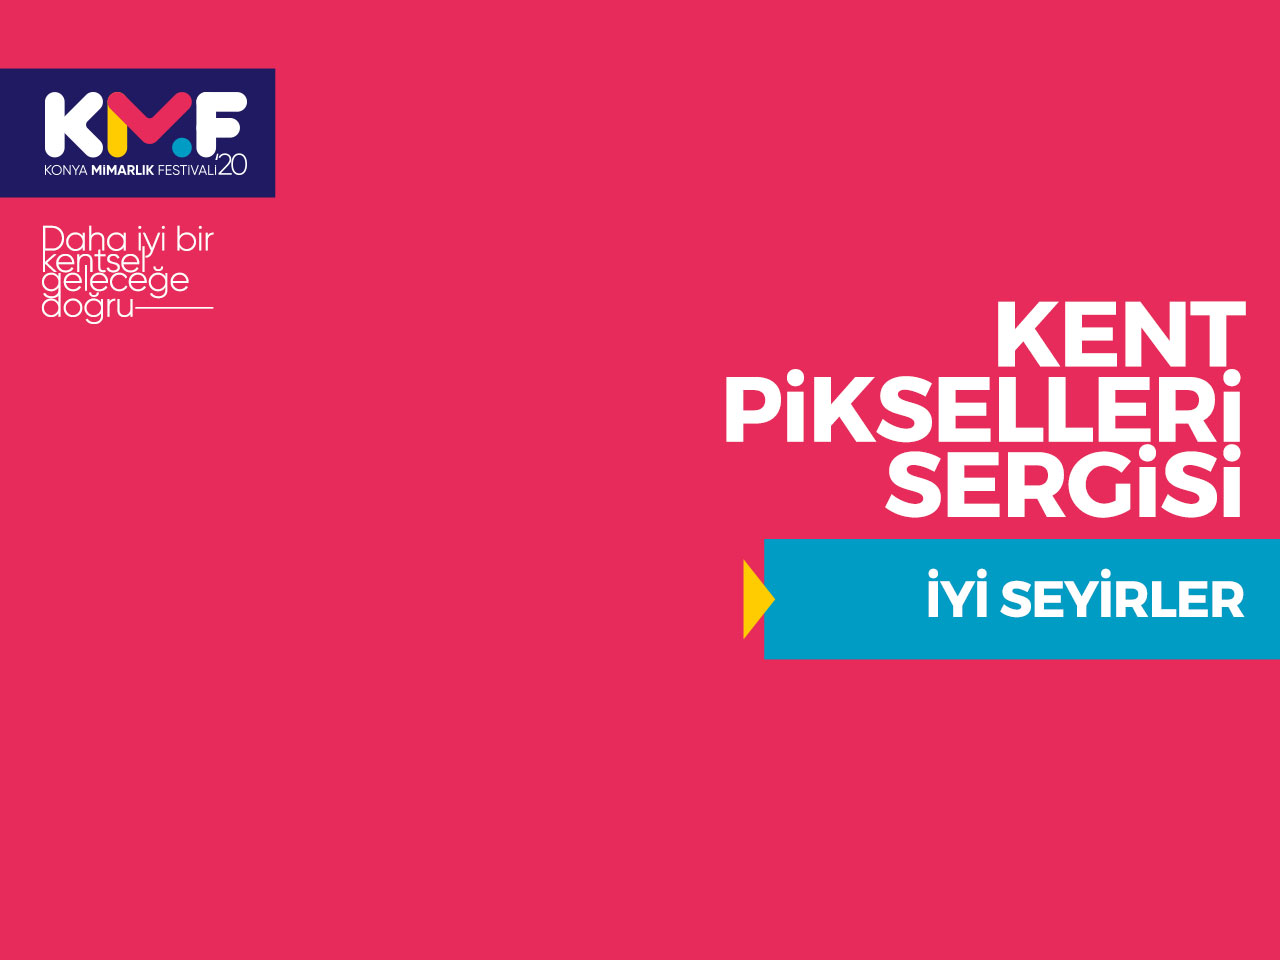 Kent Pikselleri Sergisi